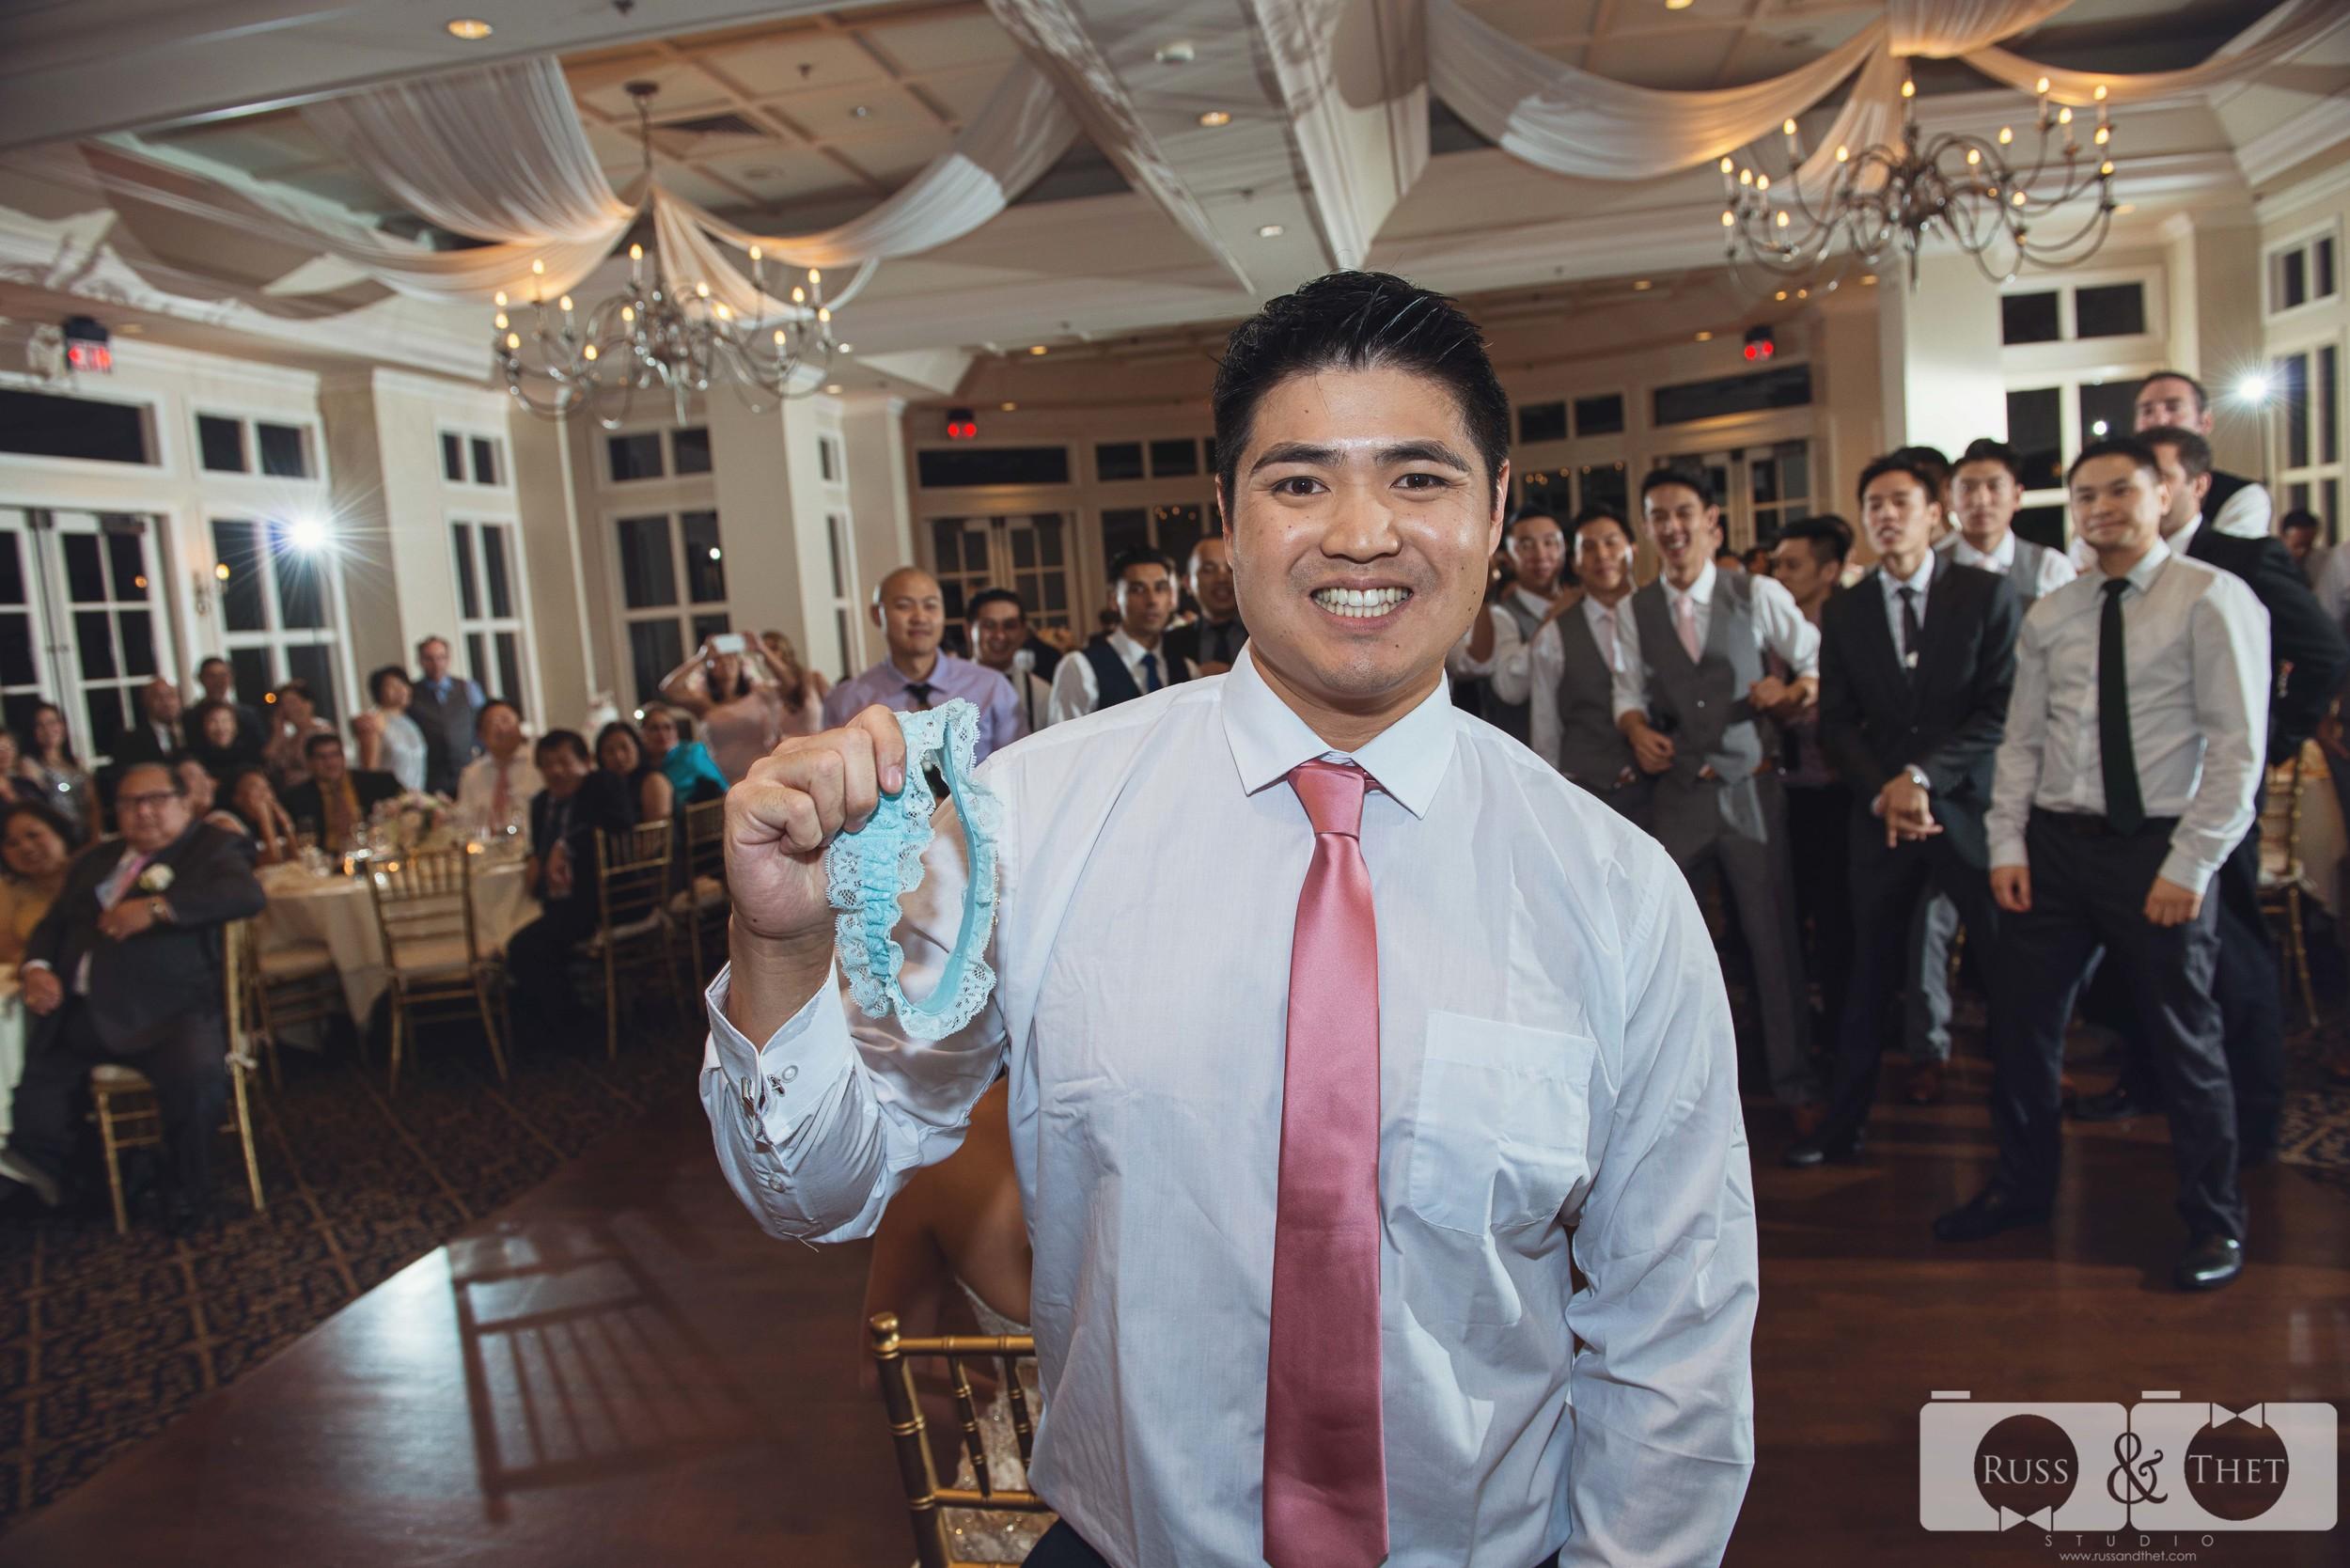 summit-house-fullerton-wedding-photographer-133.JPG